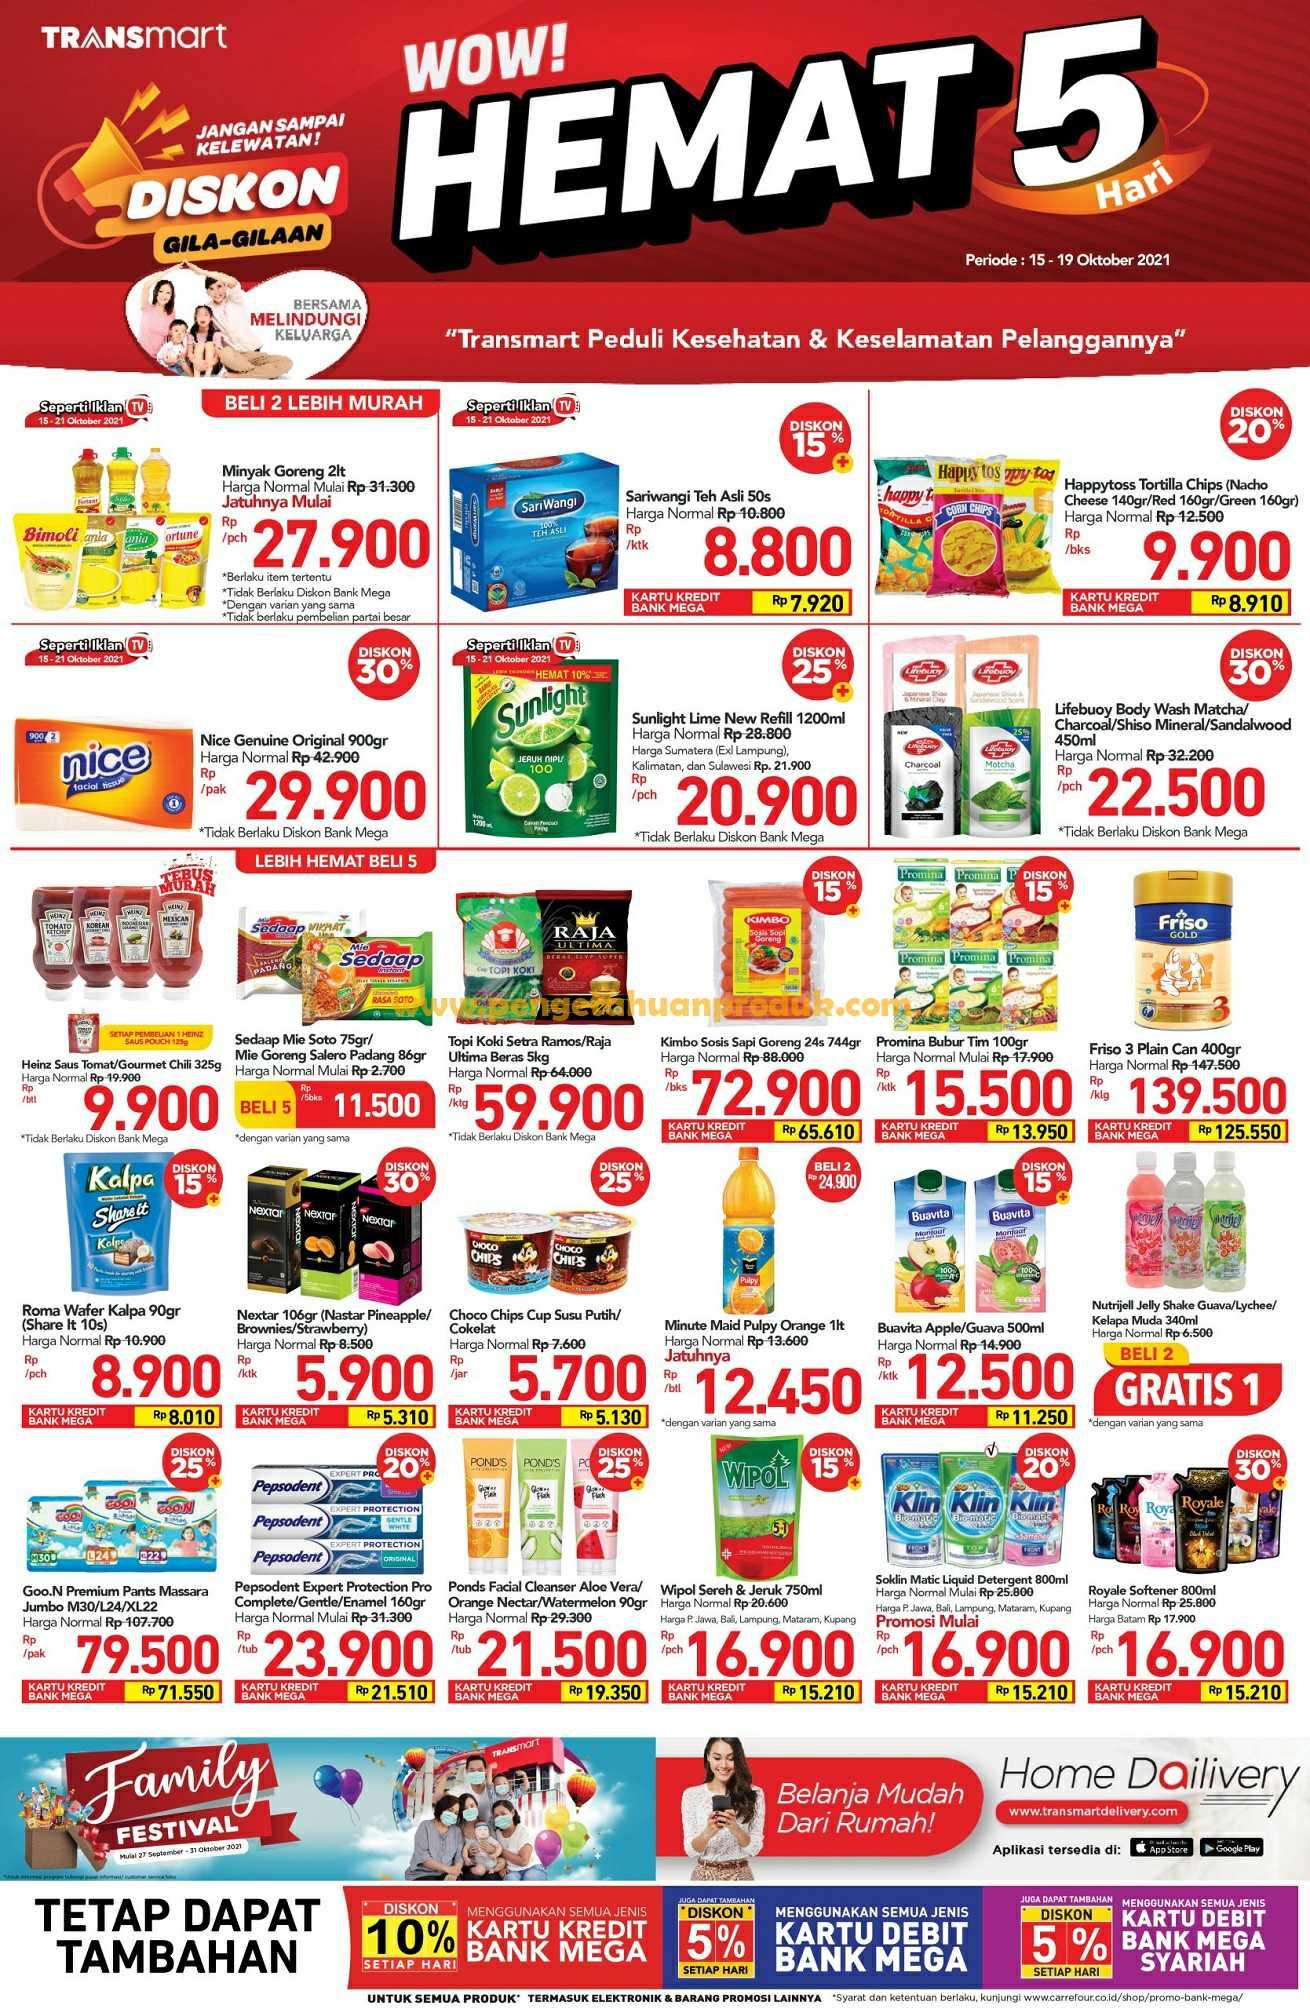 Katalog Promo Carrefour Weekend Periode 15 - 19 Oktober 2021